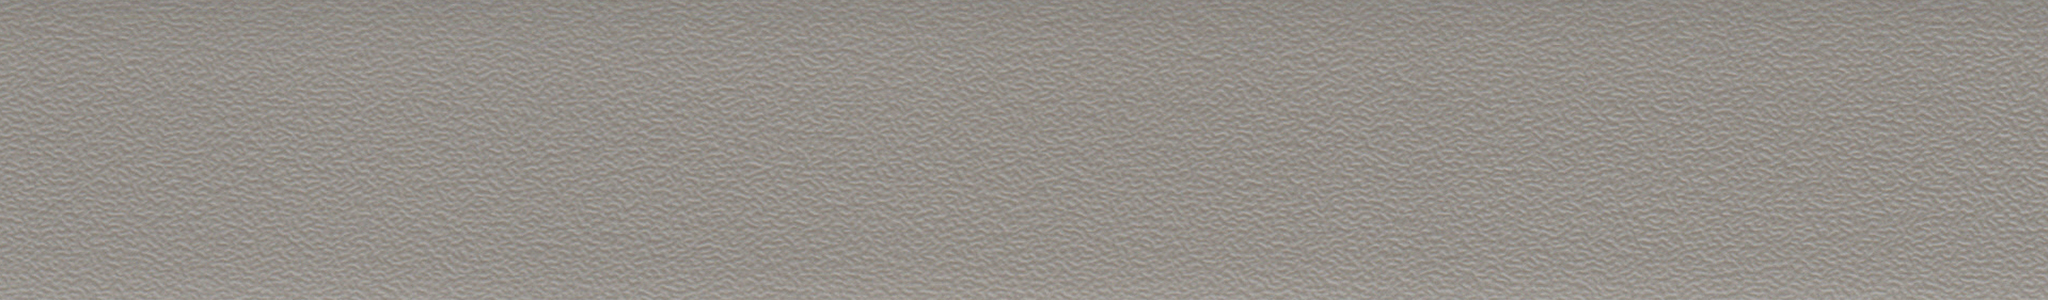 HU 187166 ABS hrana hnědá perla 101